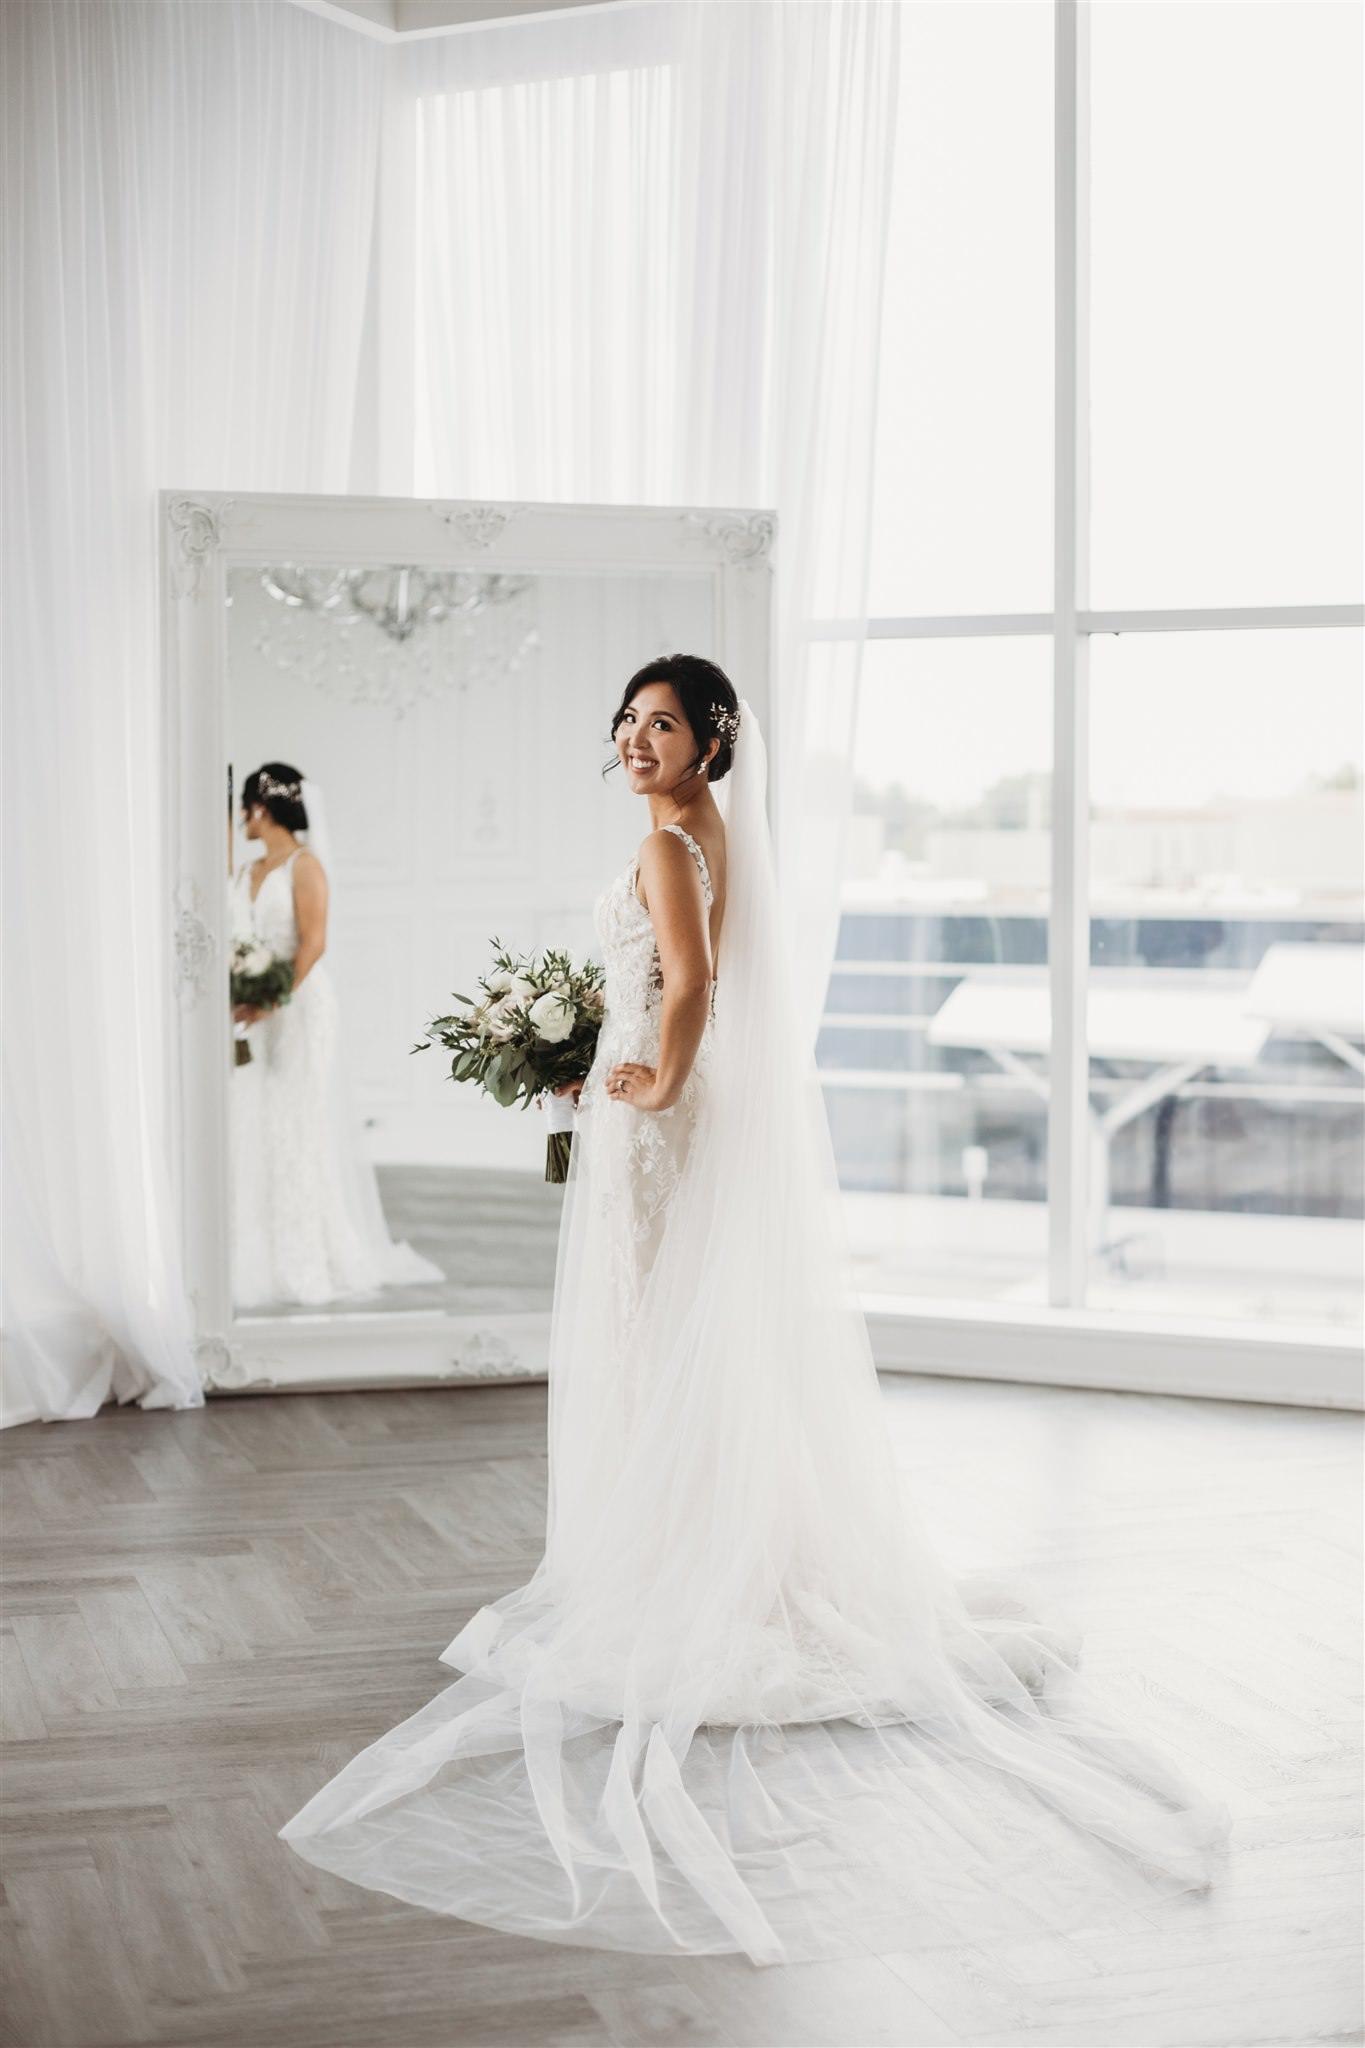 Rainy Day Backyard Wedding, Toronto wedding photographer, Ten2ten Photography, Richmond Green Wedding